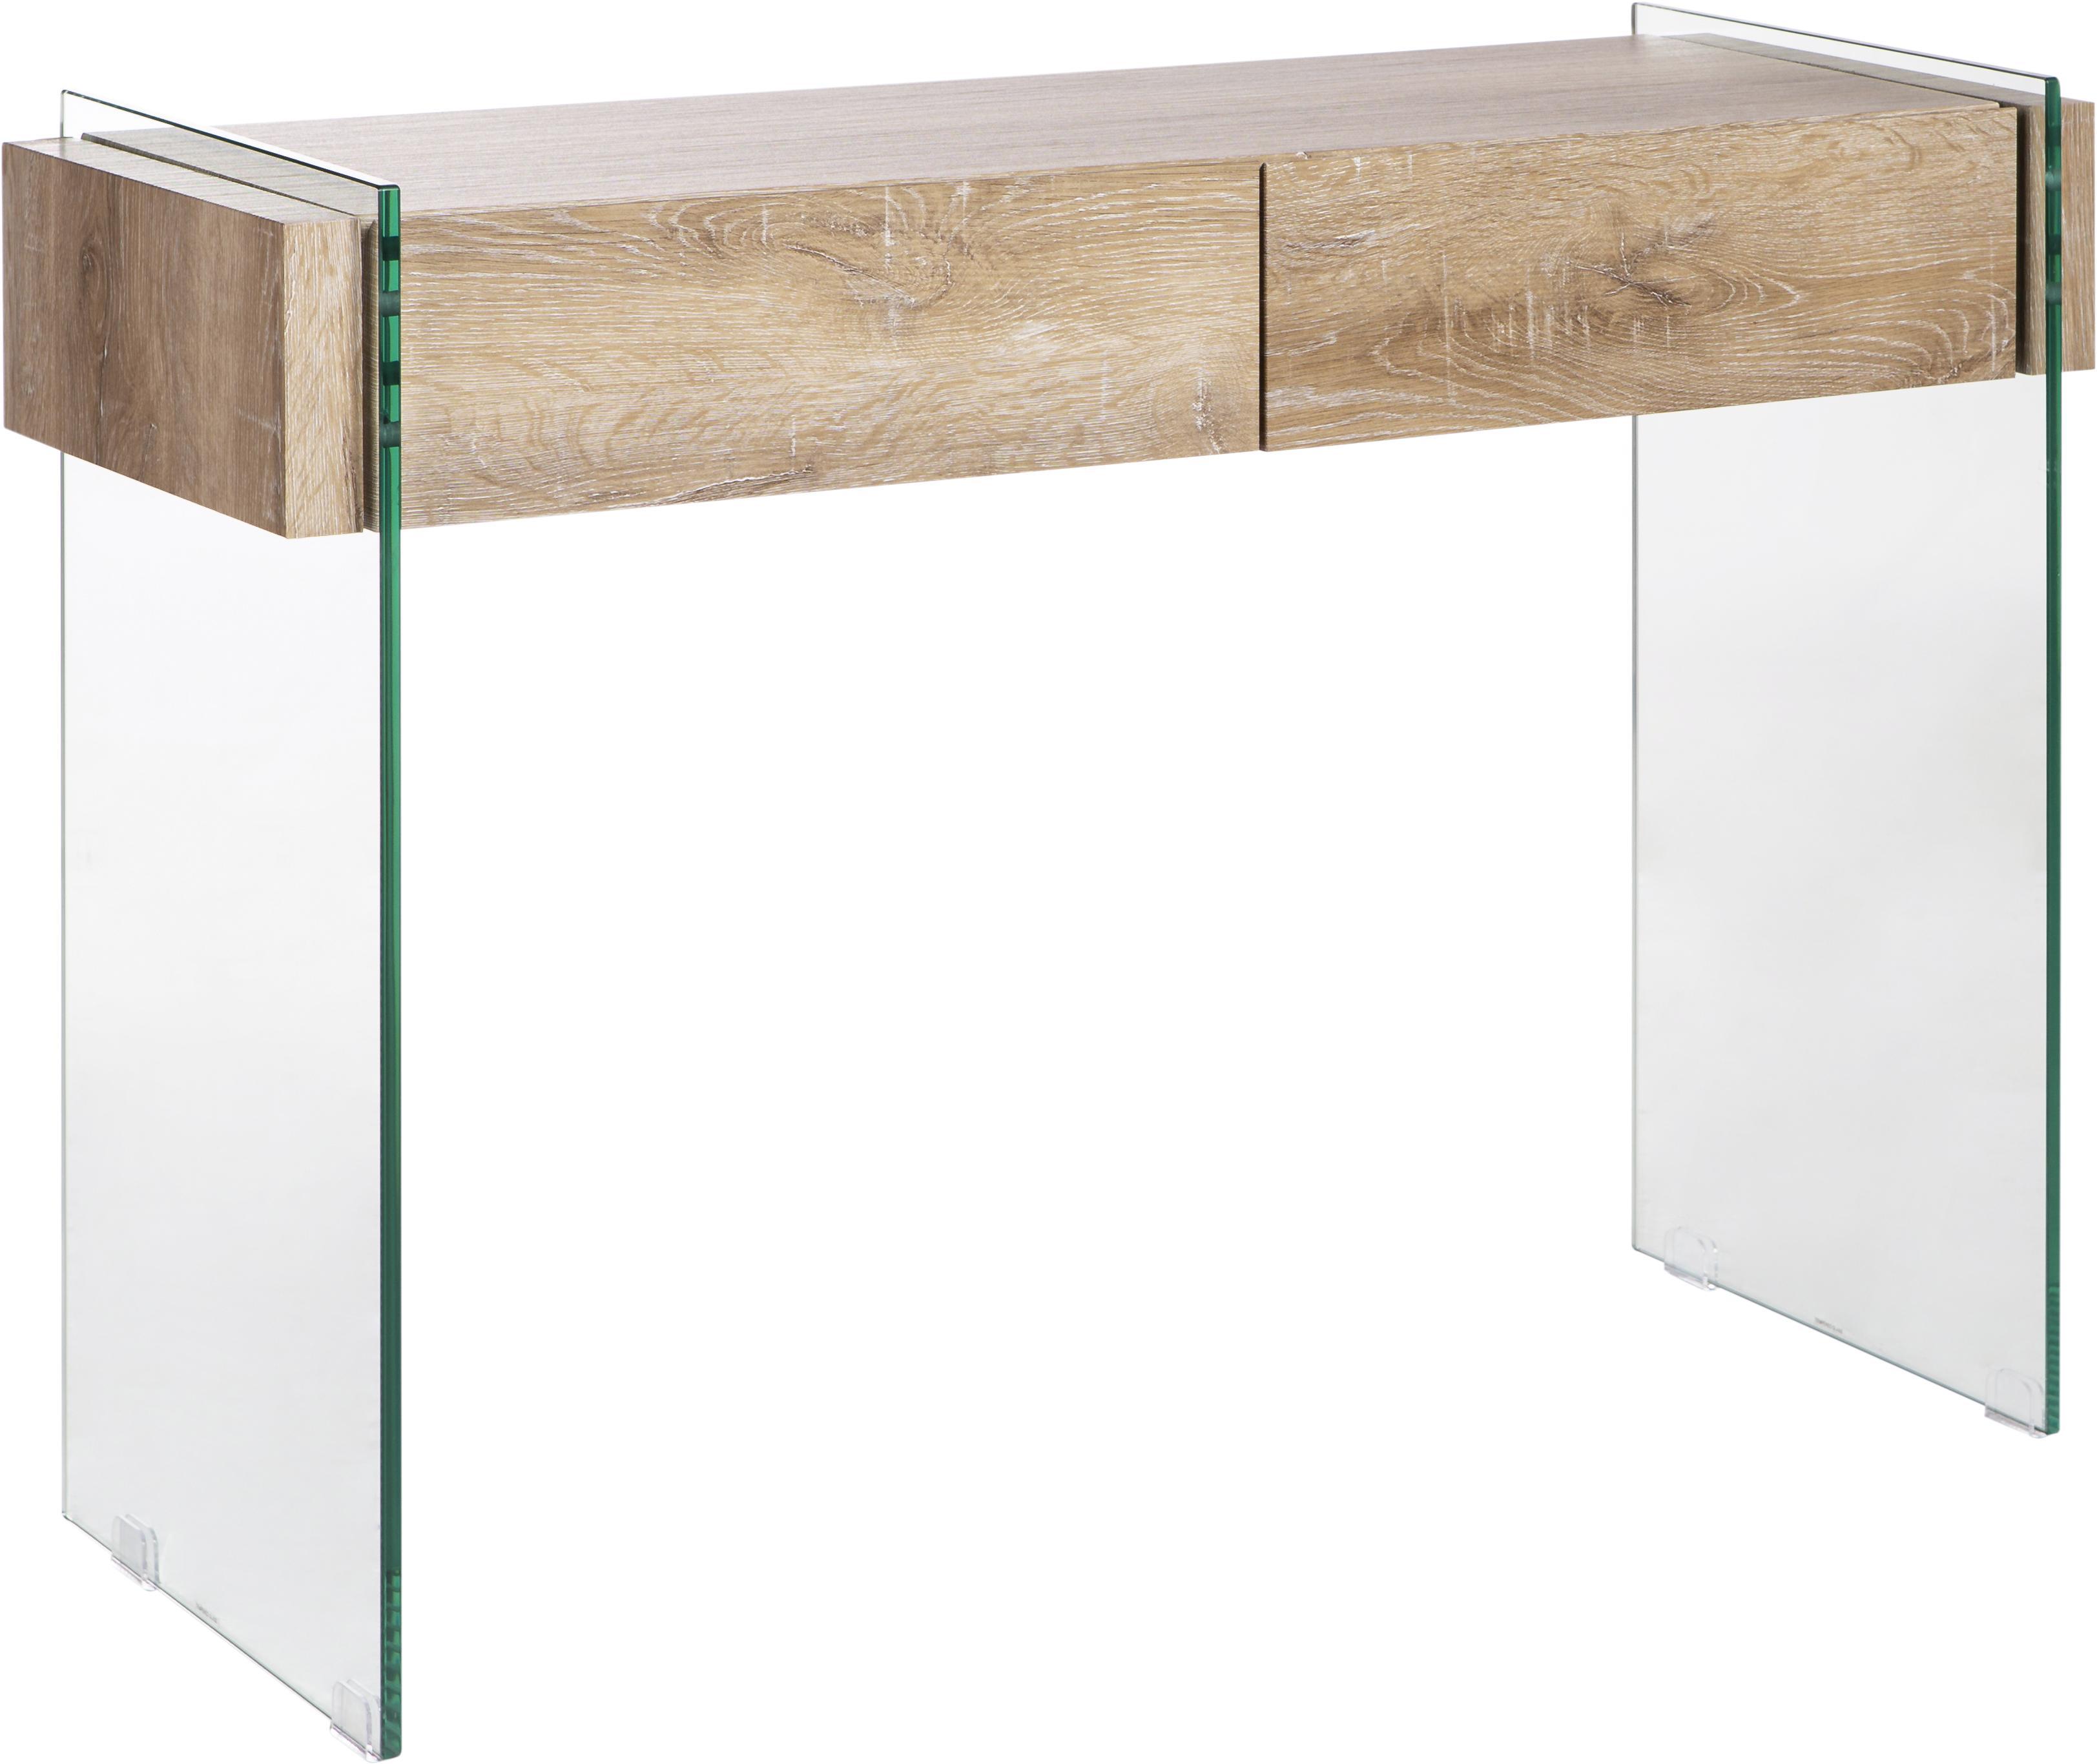 Consola Kenya, Estructura: tablero de fibras de dens, Patas: vidrio, Transparente, blanco, An 110 x Al 75 cm